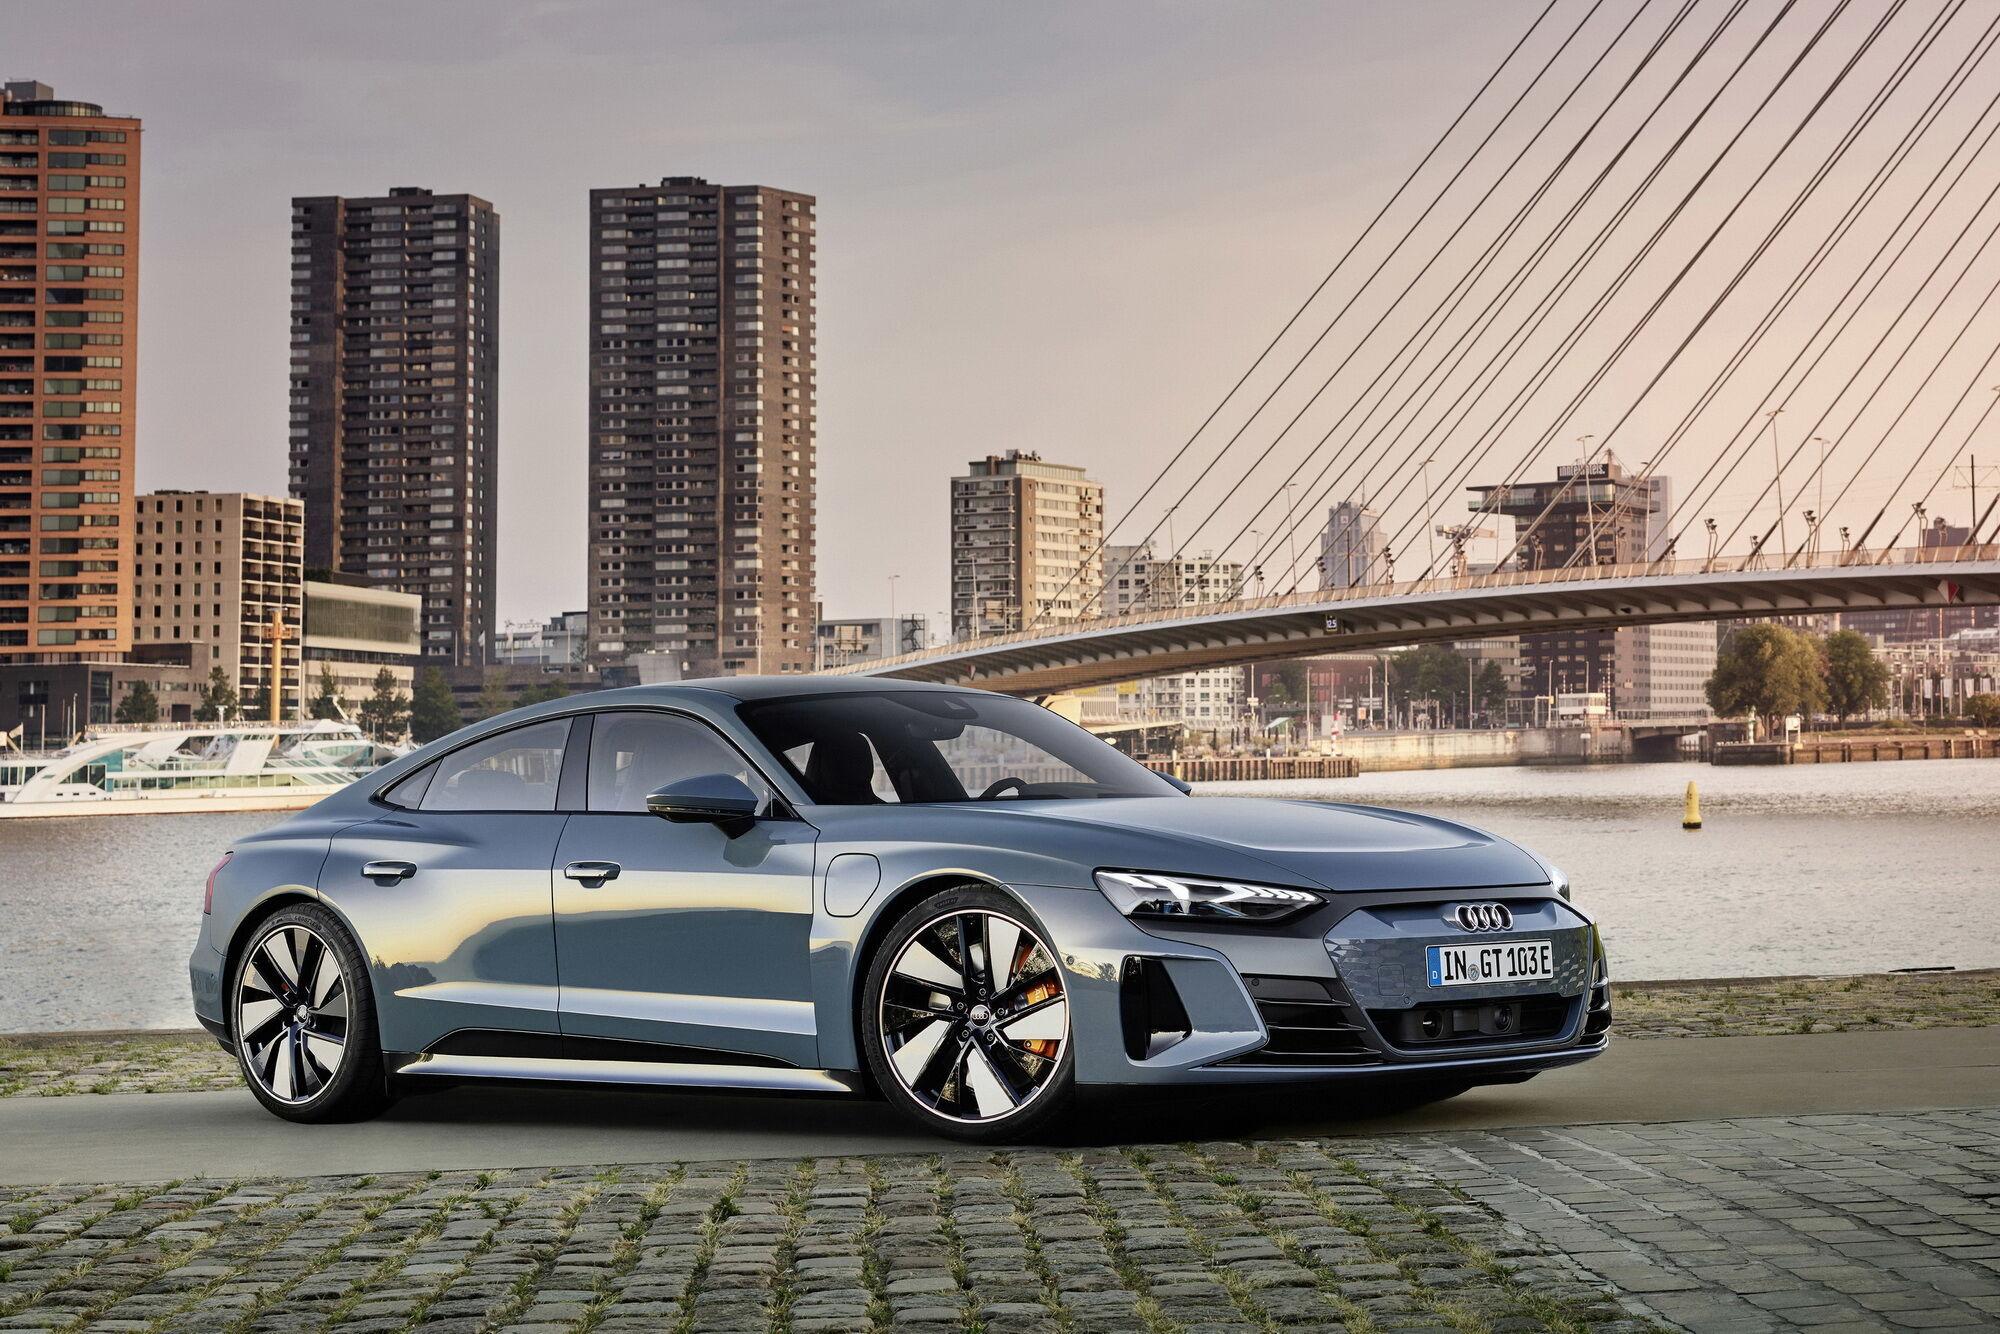 Автомобиль будет предложен покупателям в двух версиях – e-tron GT quattro (на фото) и RS e-tron GT